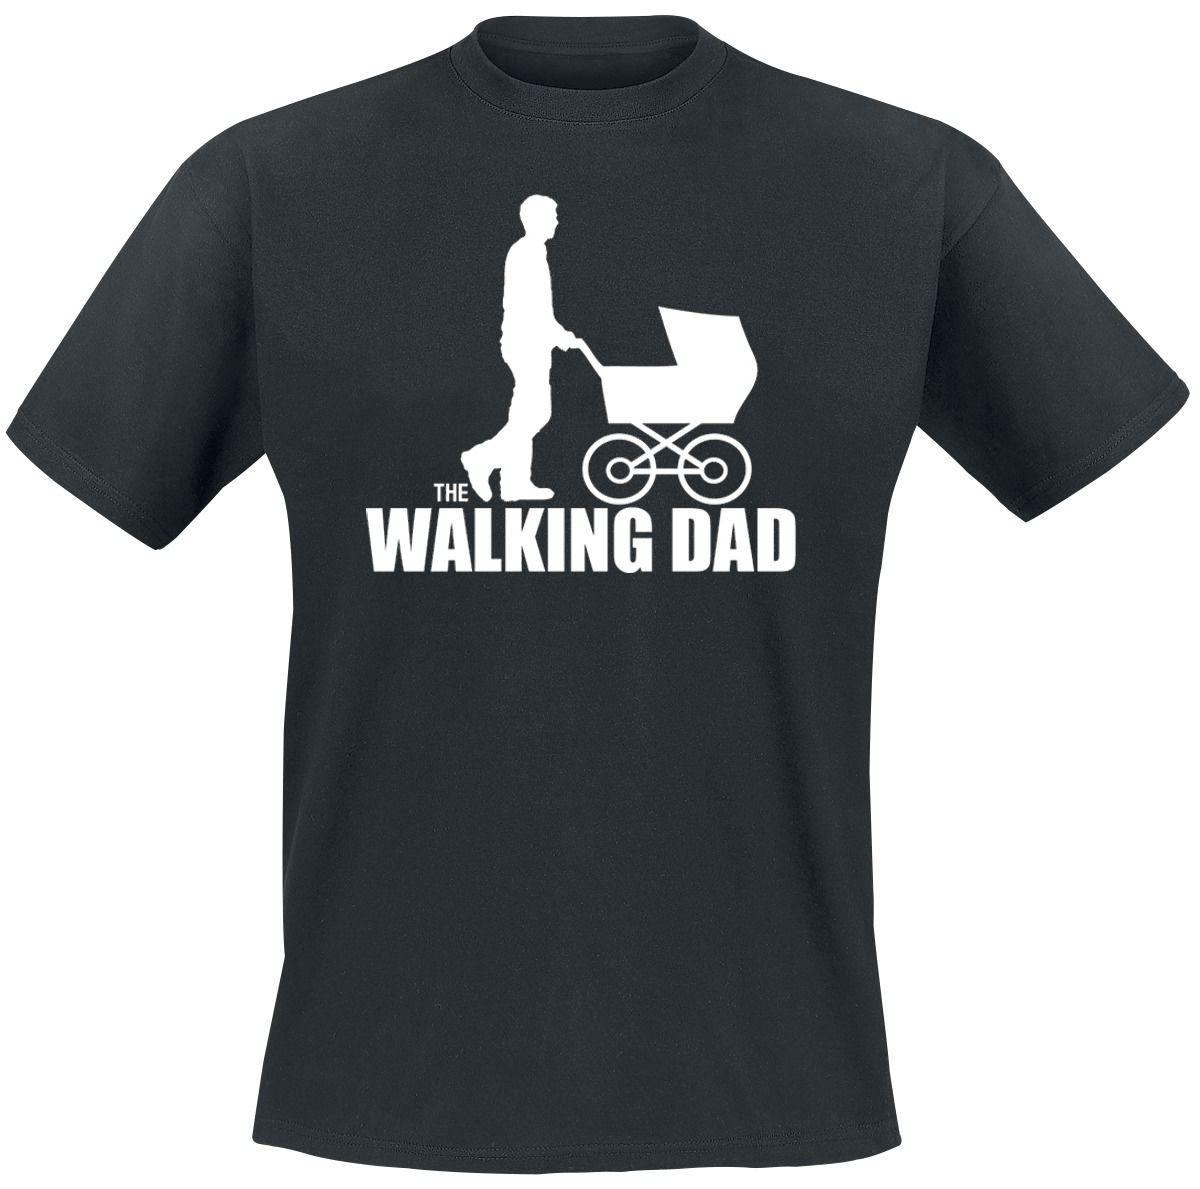 Camisetas para padres primerizos